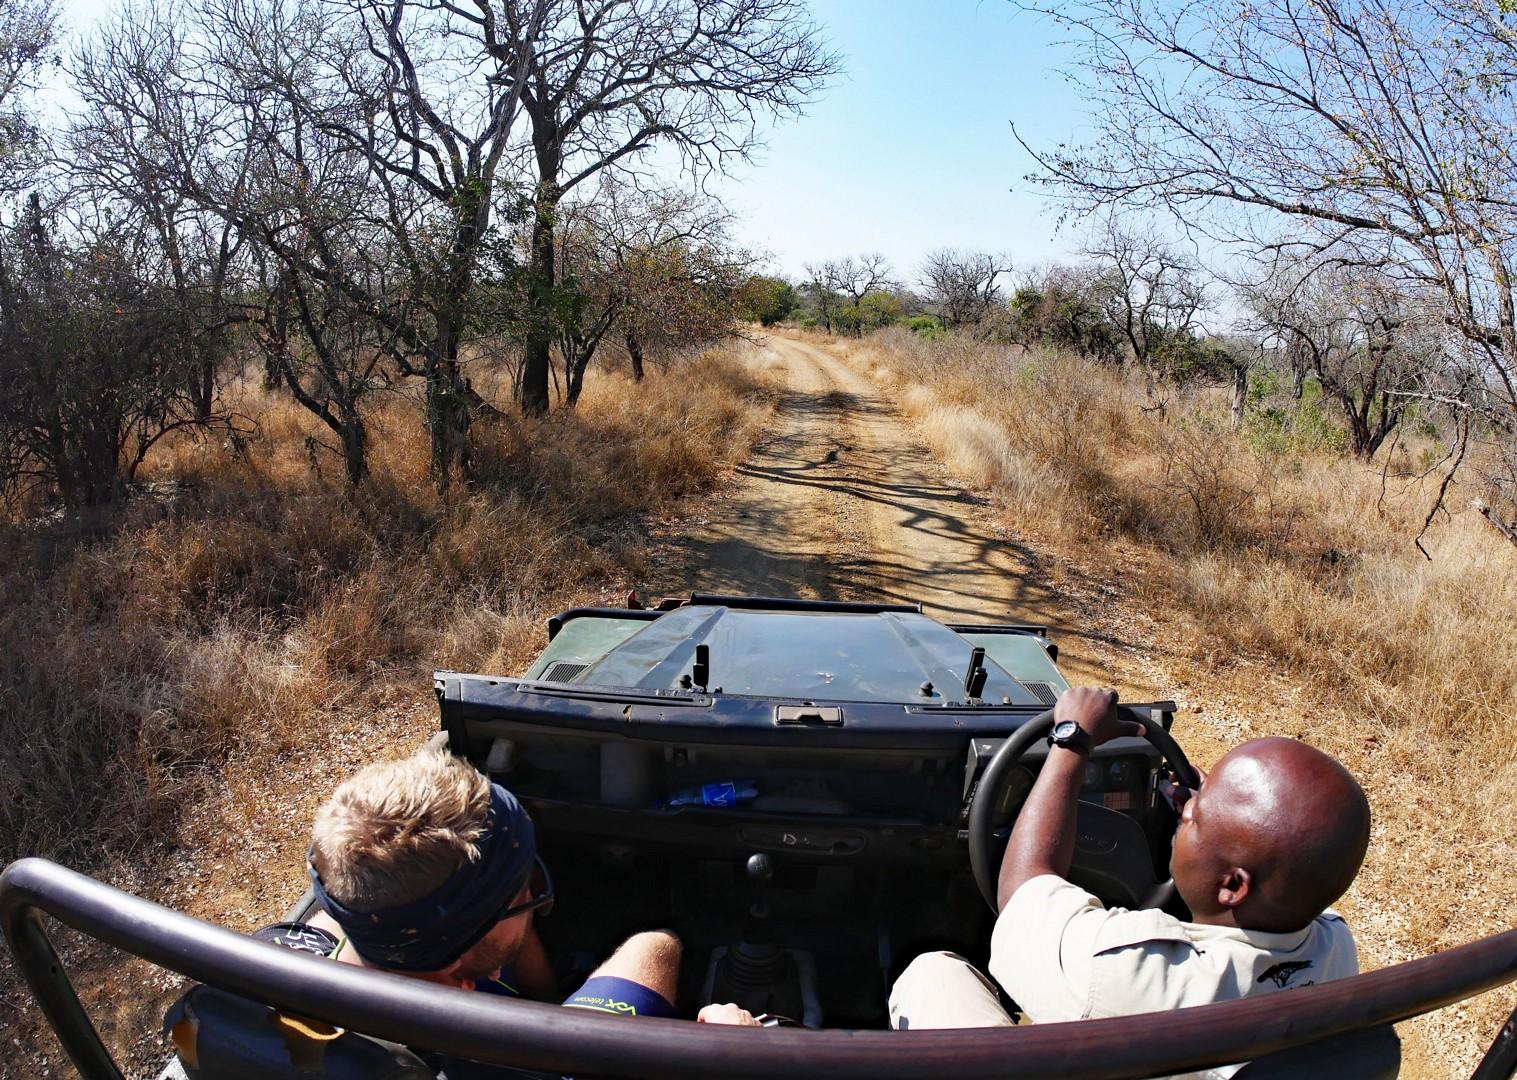 africa-swaziland-cycling safari-cycling-adventure.jpg - Swaziland (Eswatini) - Cycling Safari - Cycling Adventures